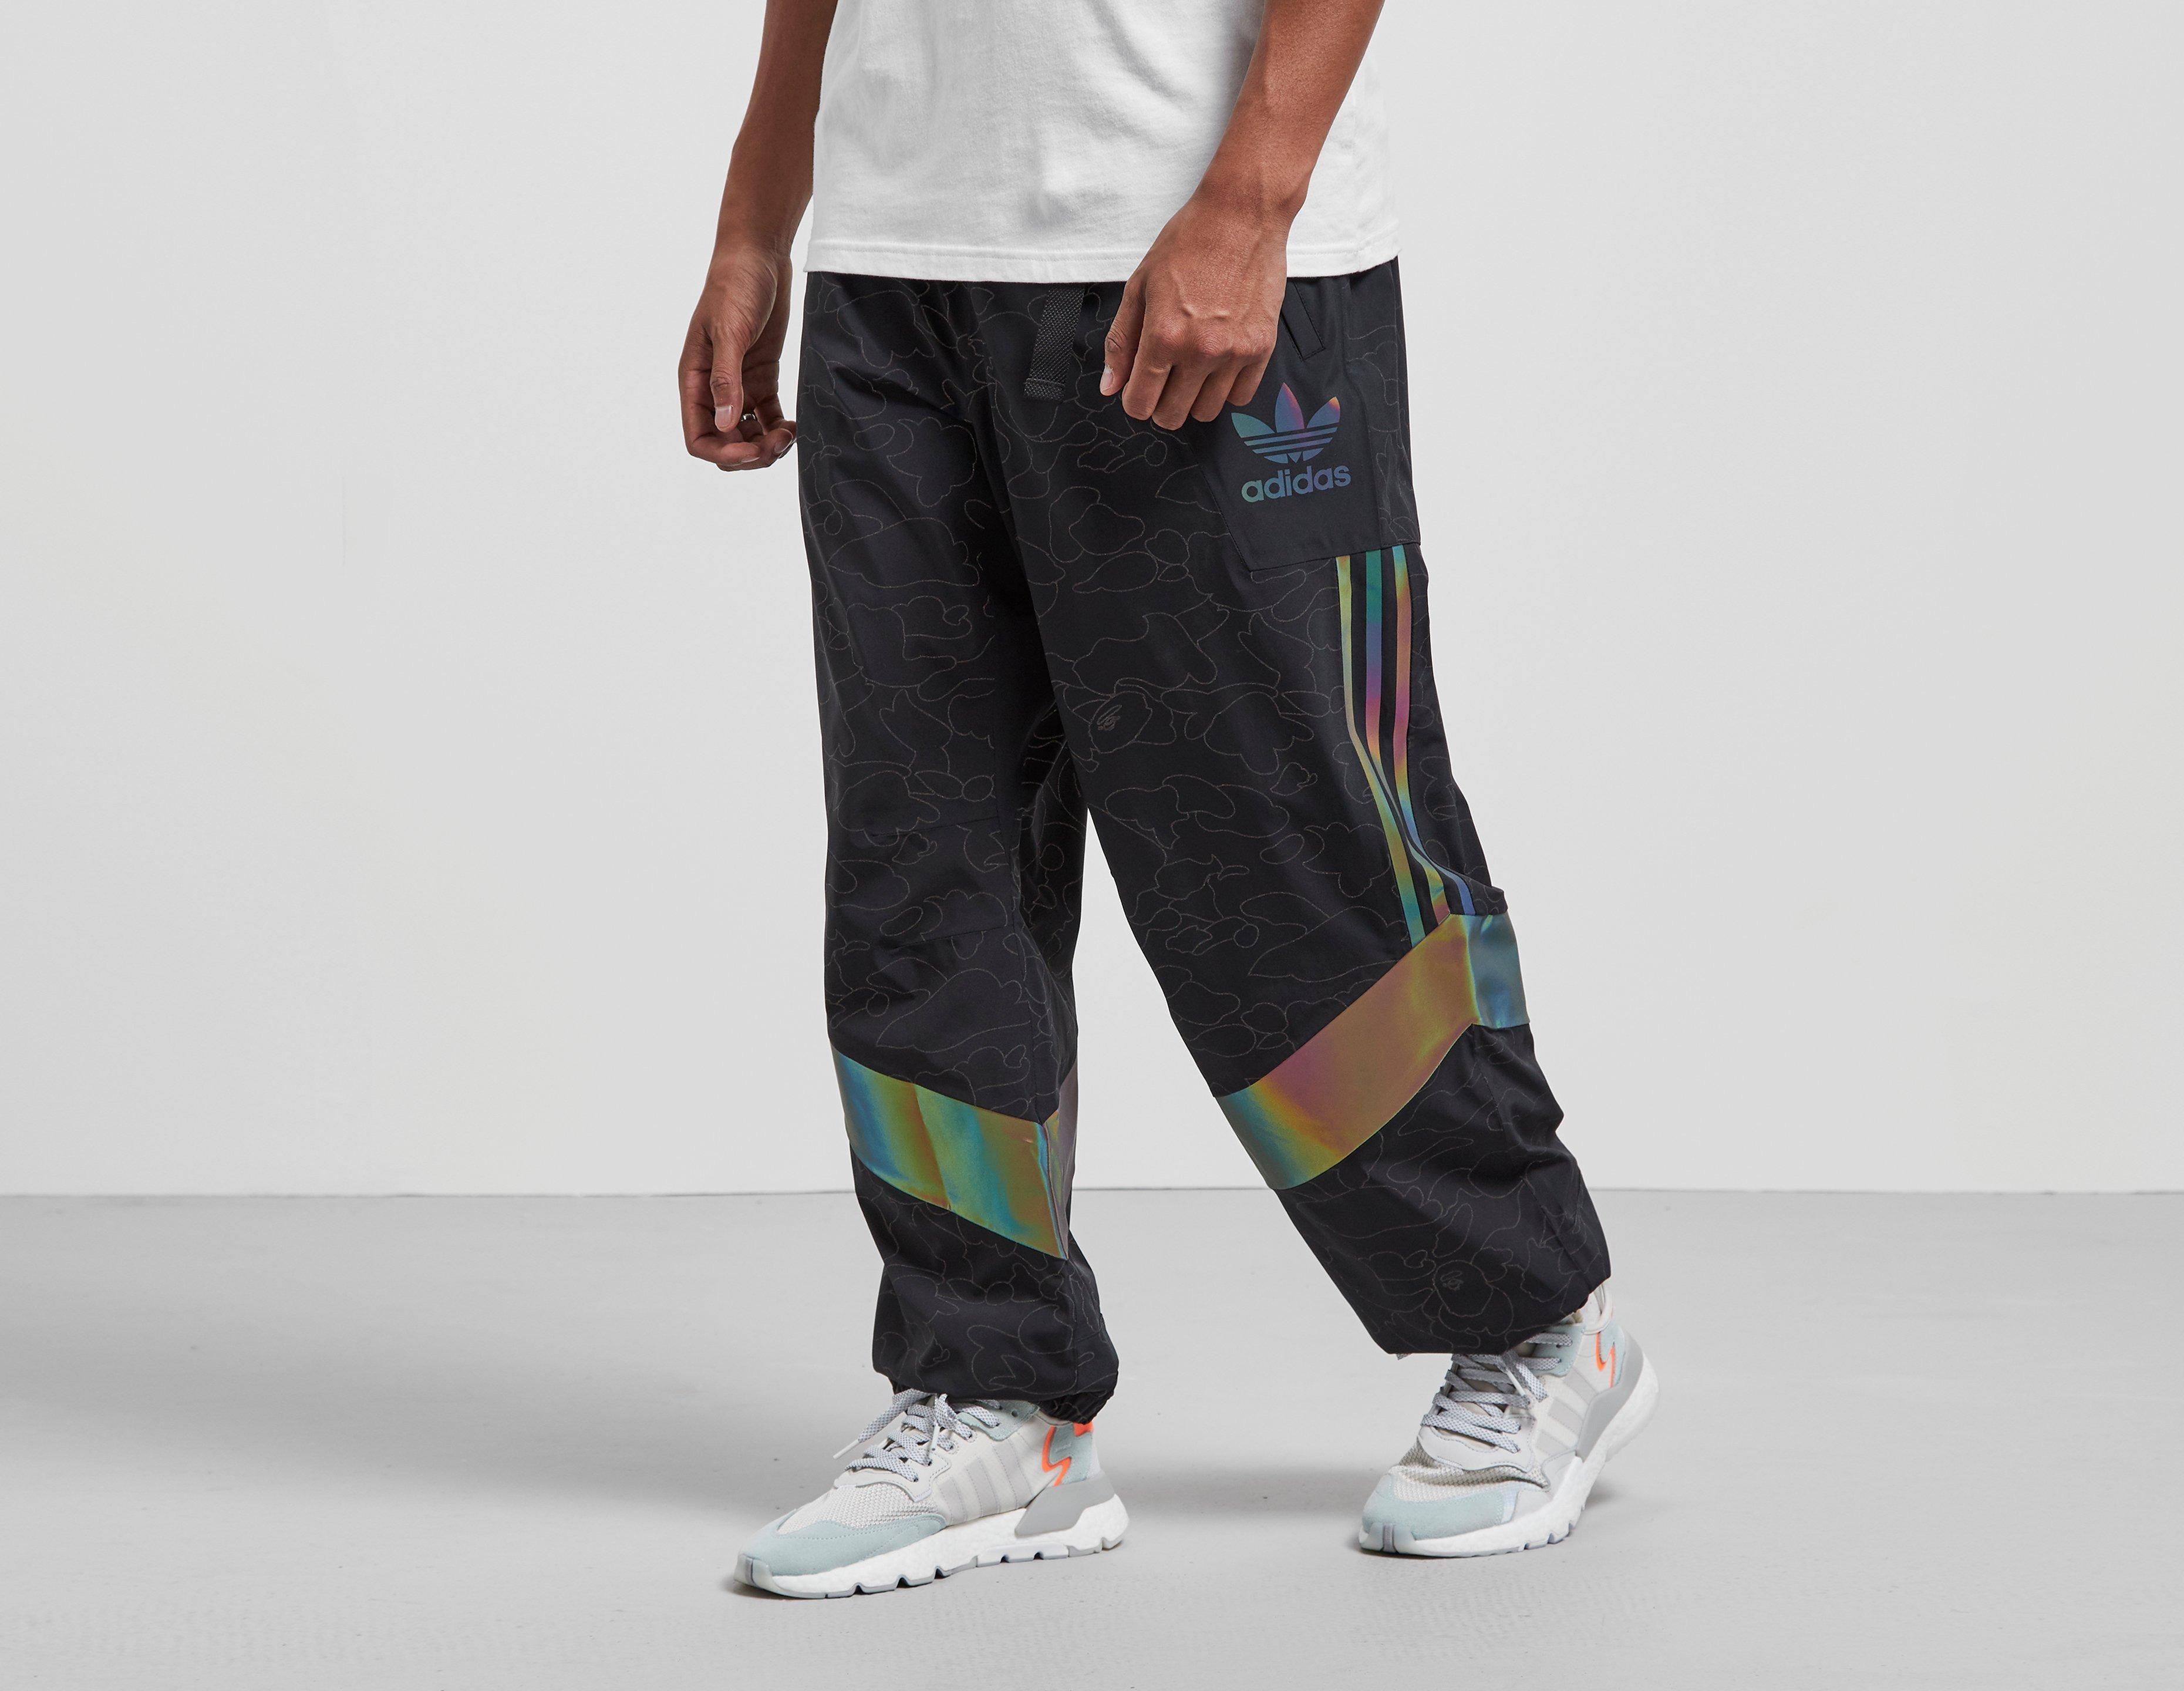 bape x adidas shorts